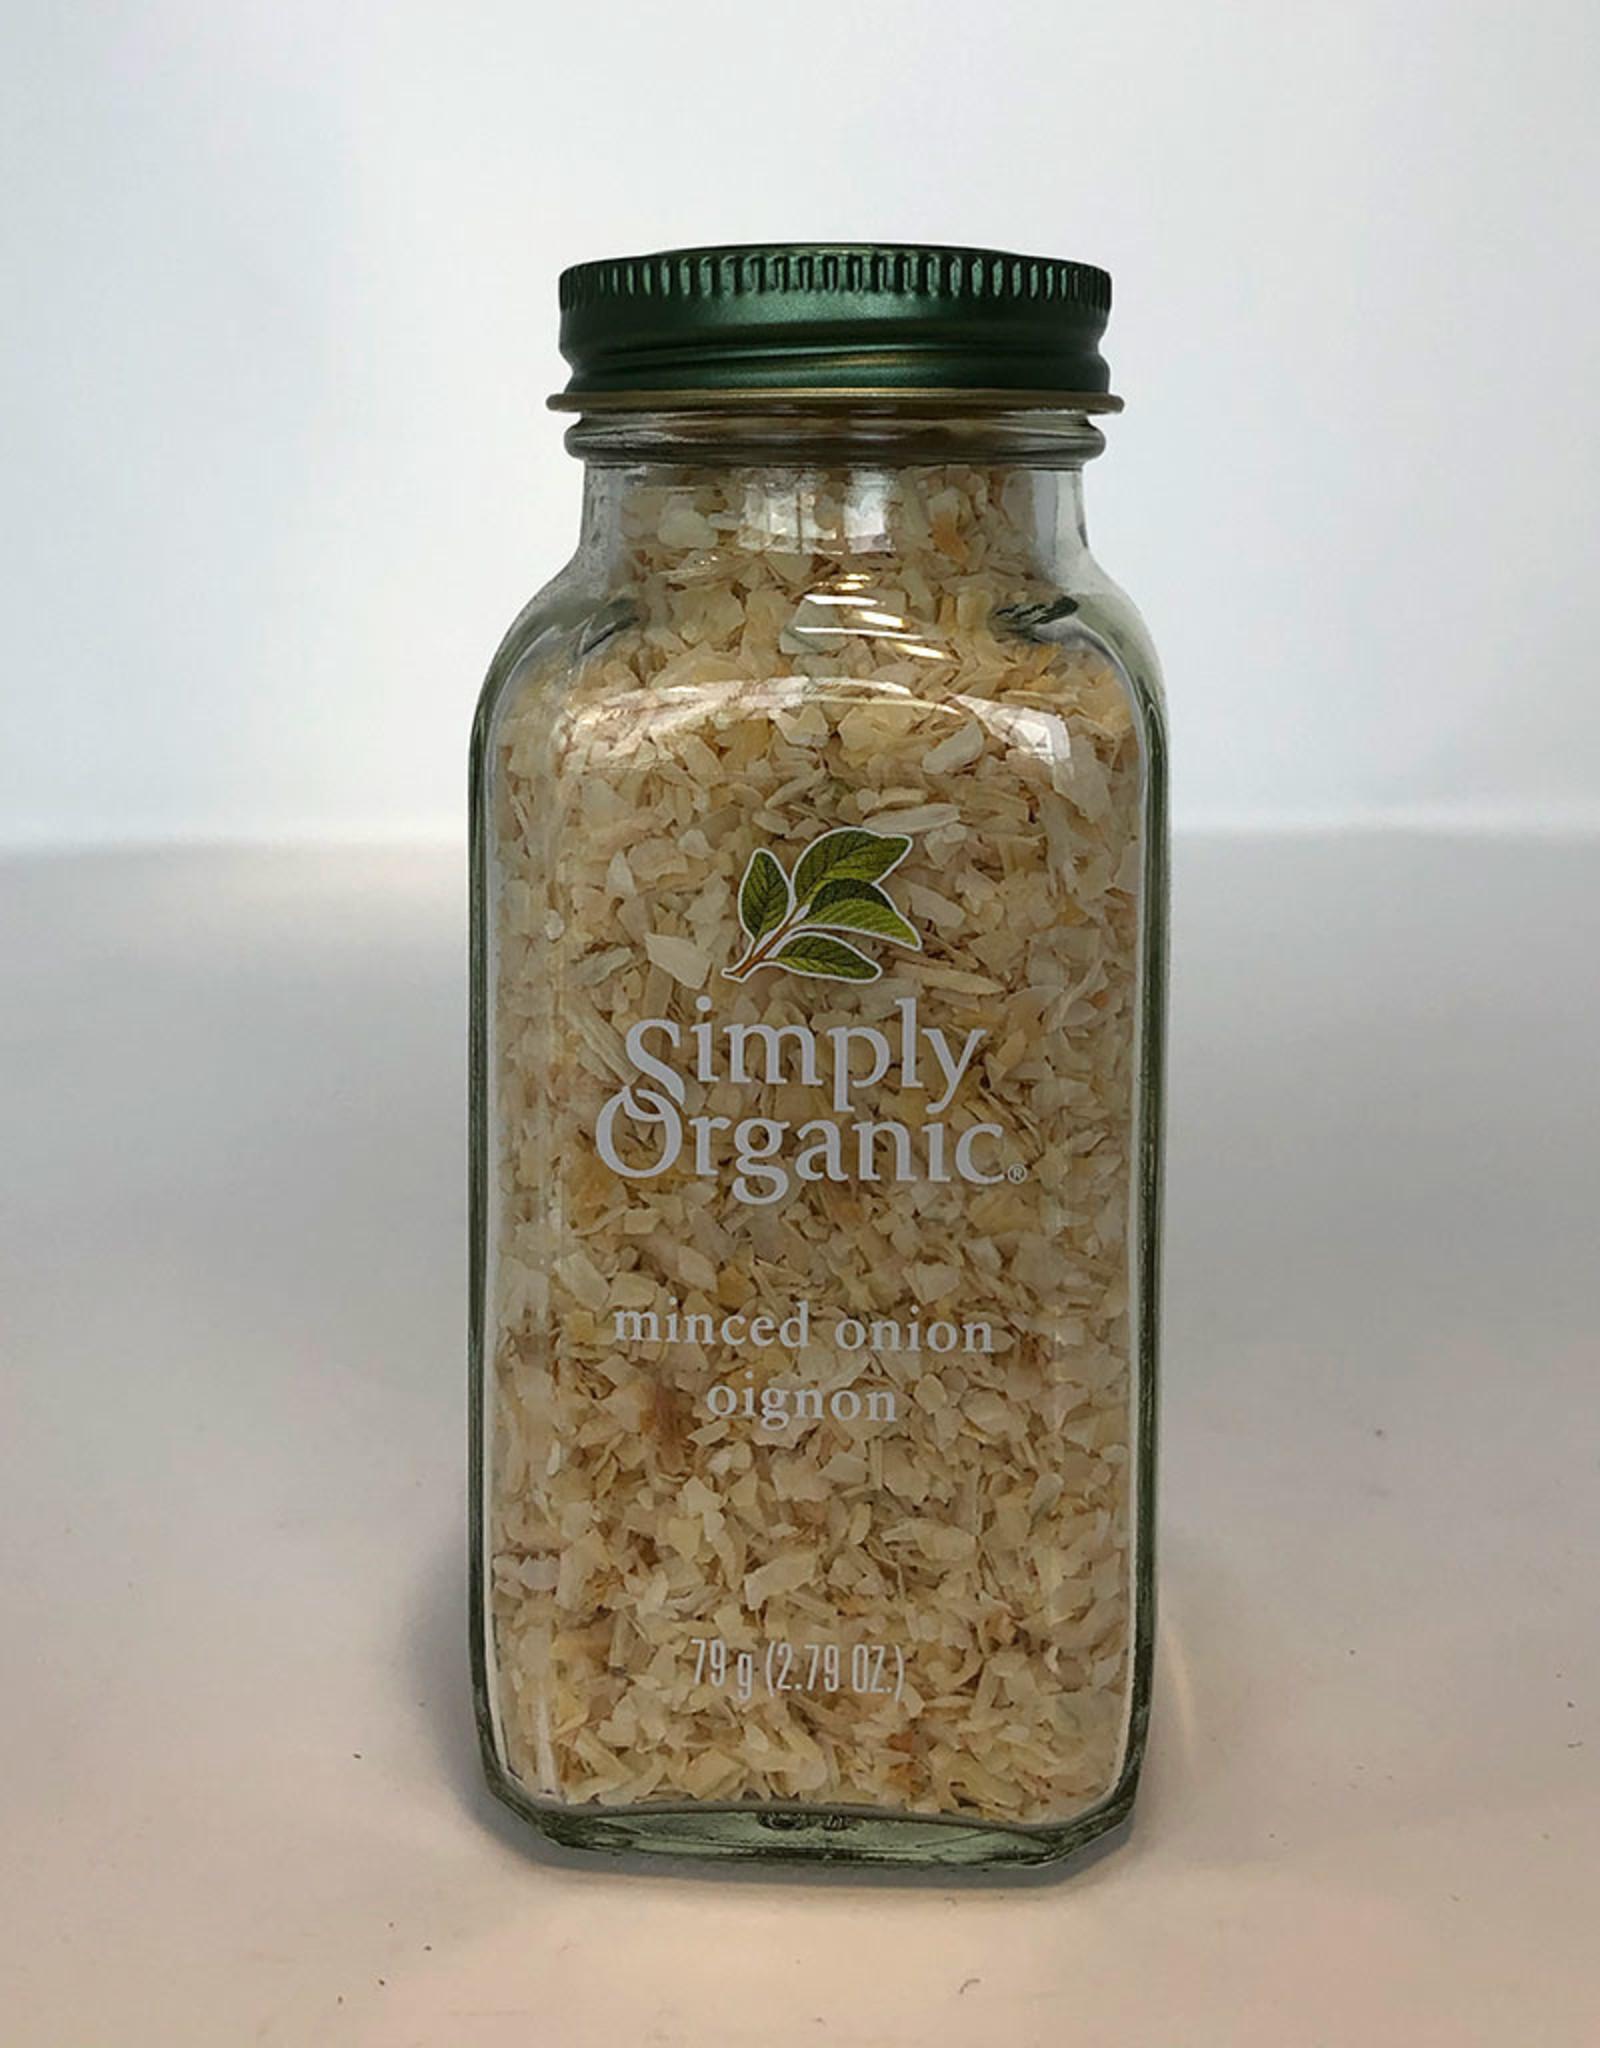 Simply Organic Simply Organic - Minced Onion (79g)